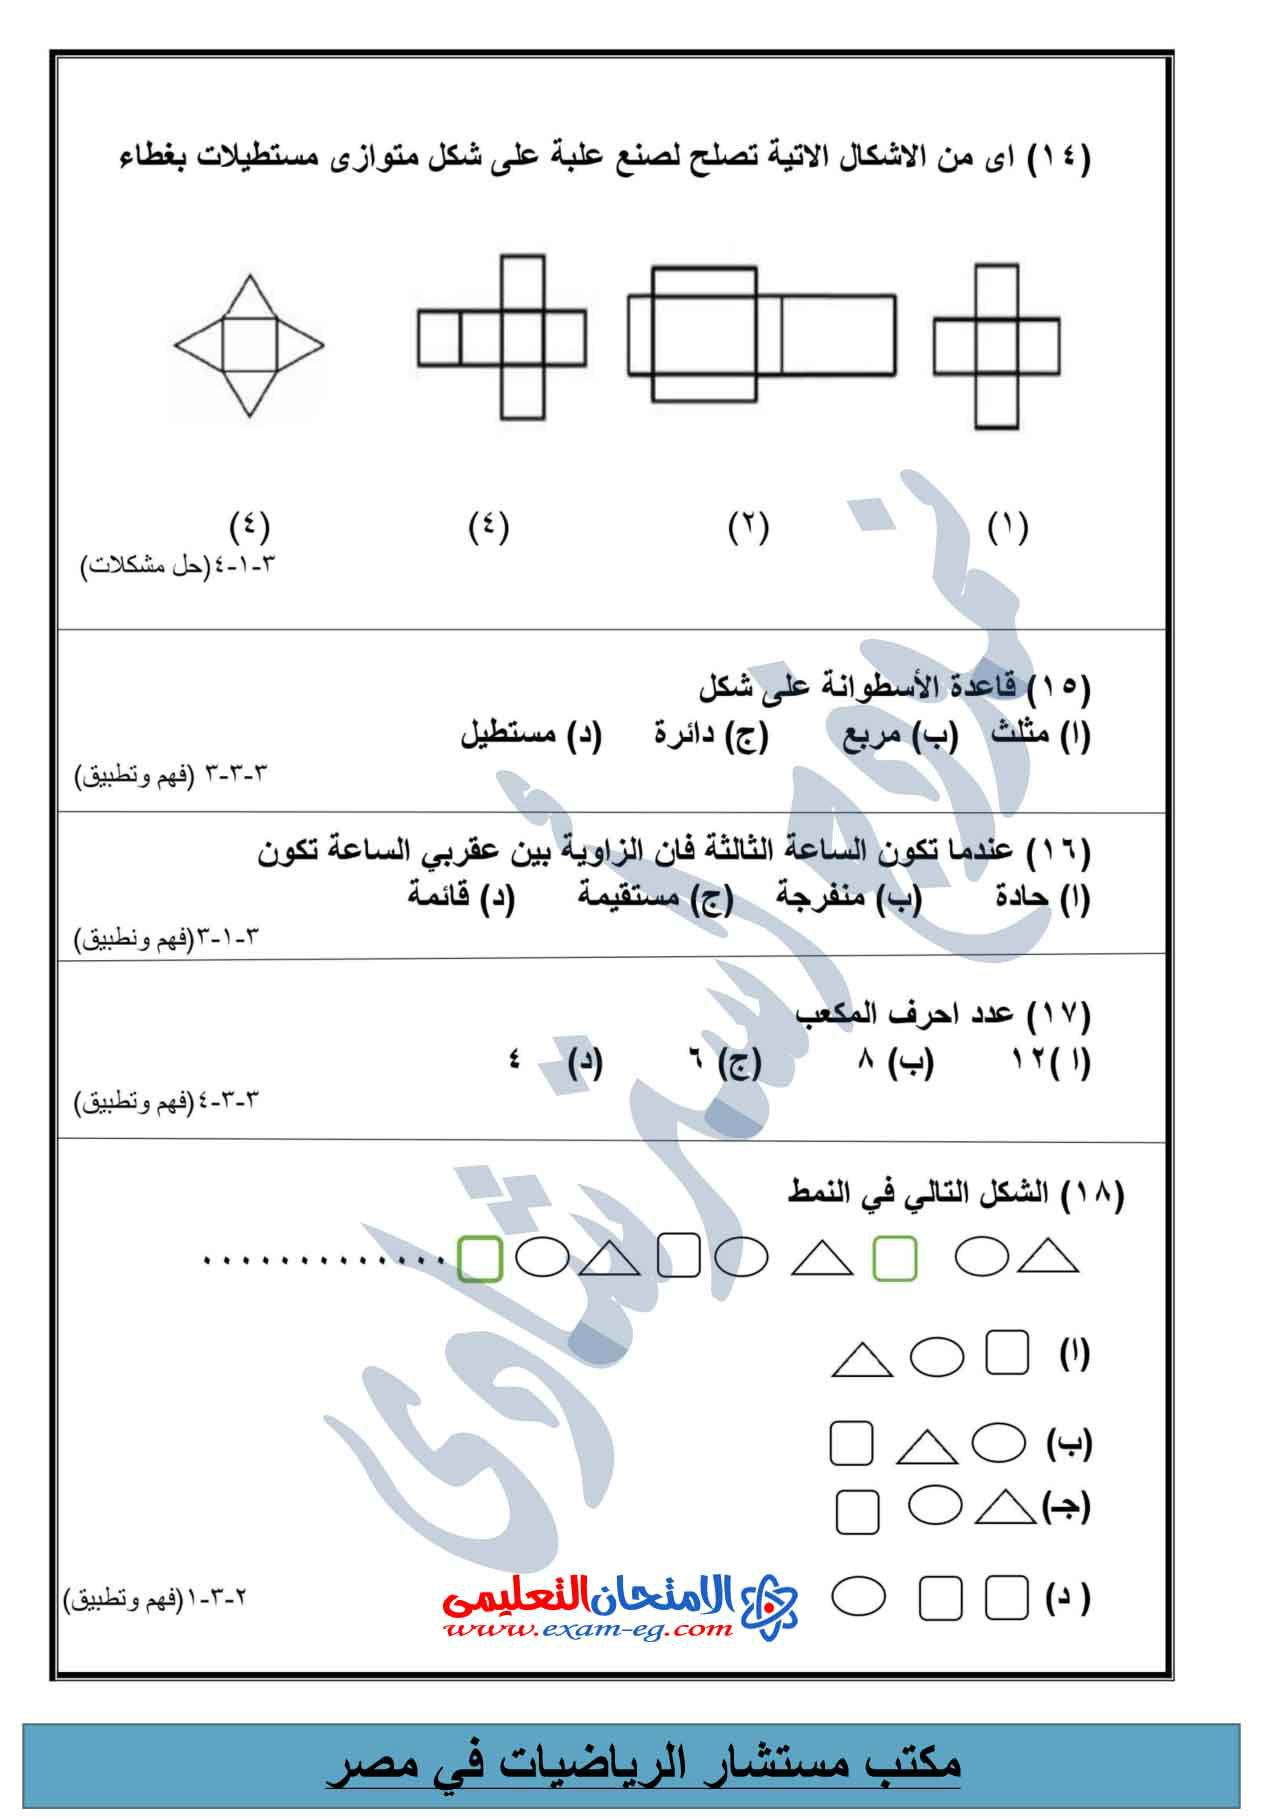 exam-eg.com_14492420354218.jpg